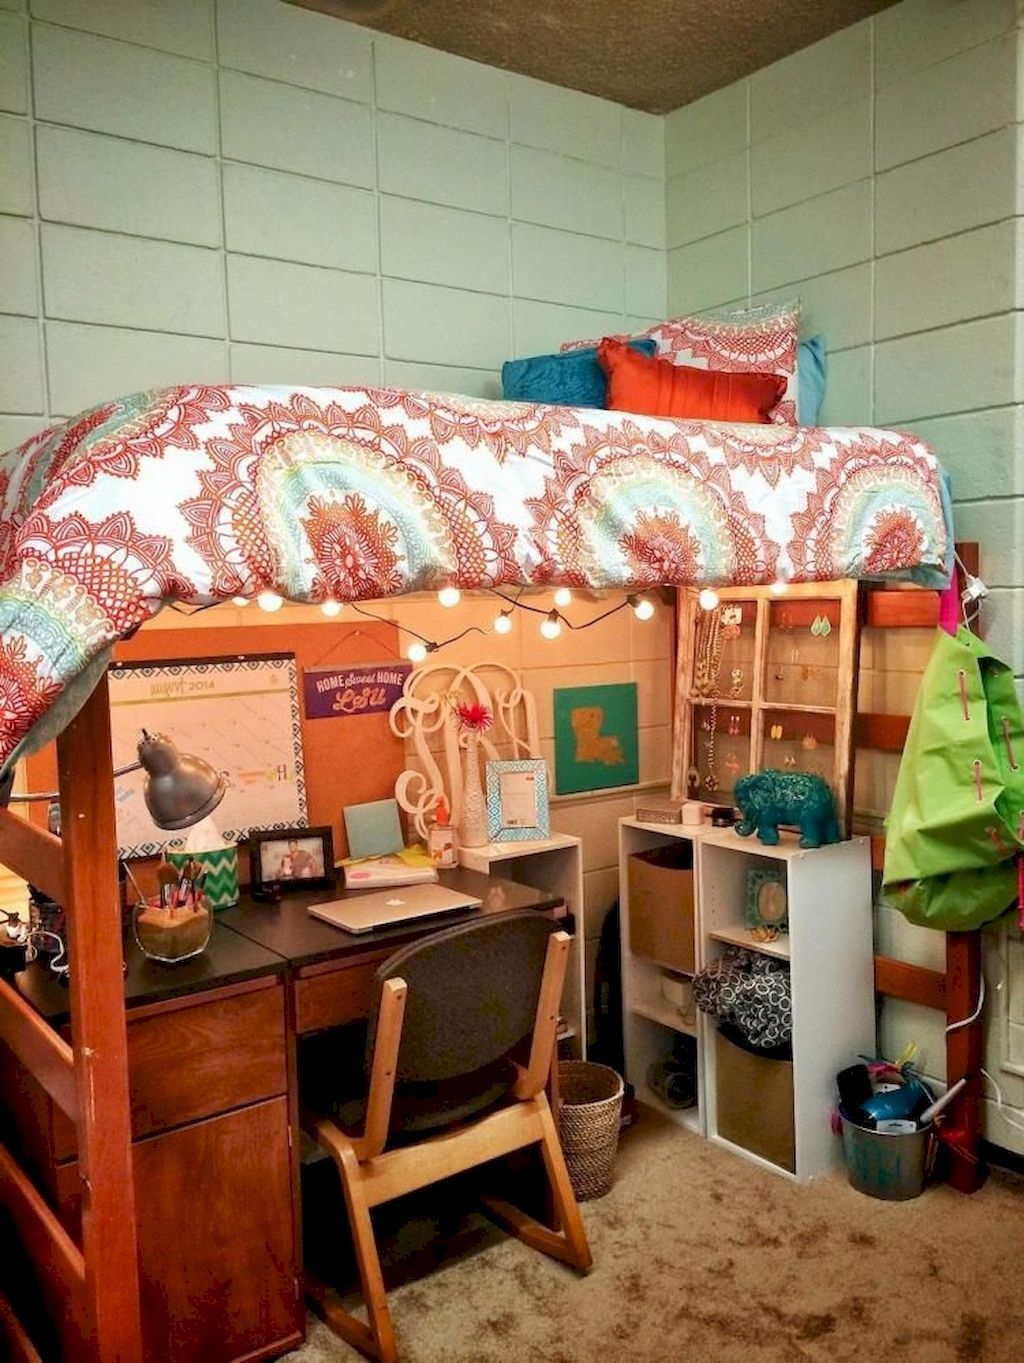 Creative Dorm Room Storage Organization Ideas DIY College Dorm Room on A Budget images